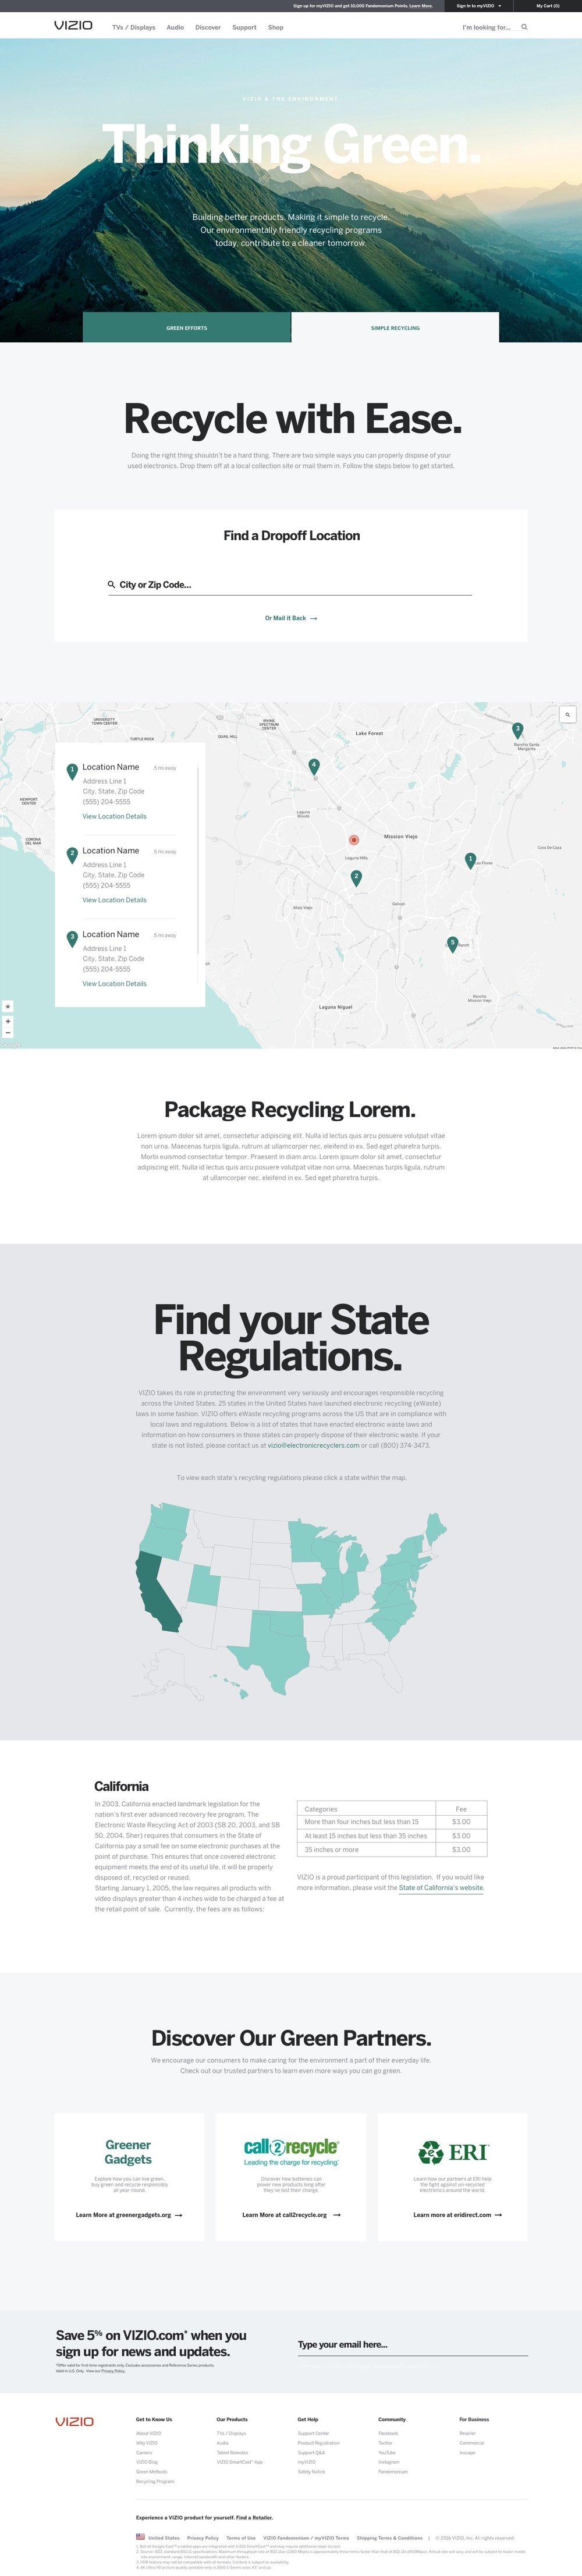 DESKTOP Green Methods - Recycling.jpg